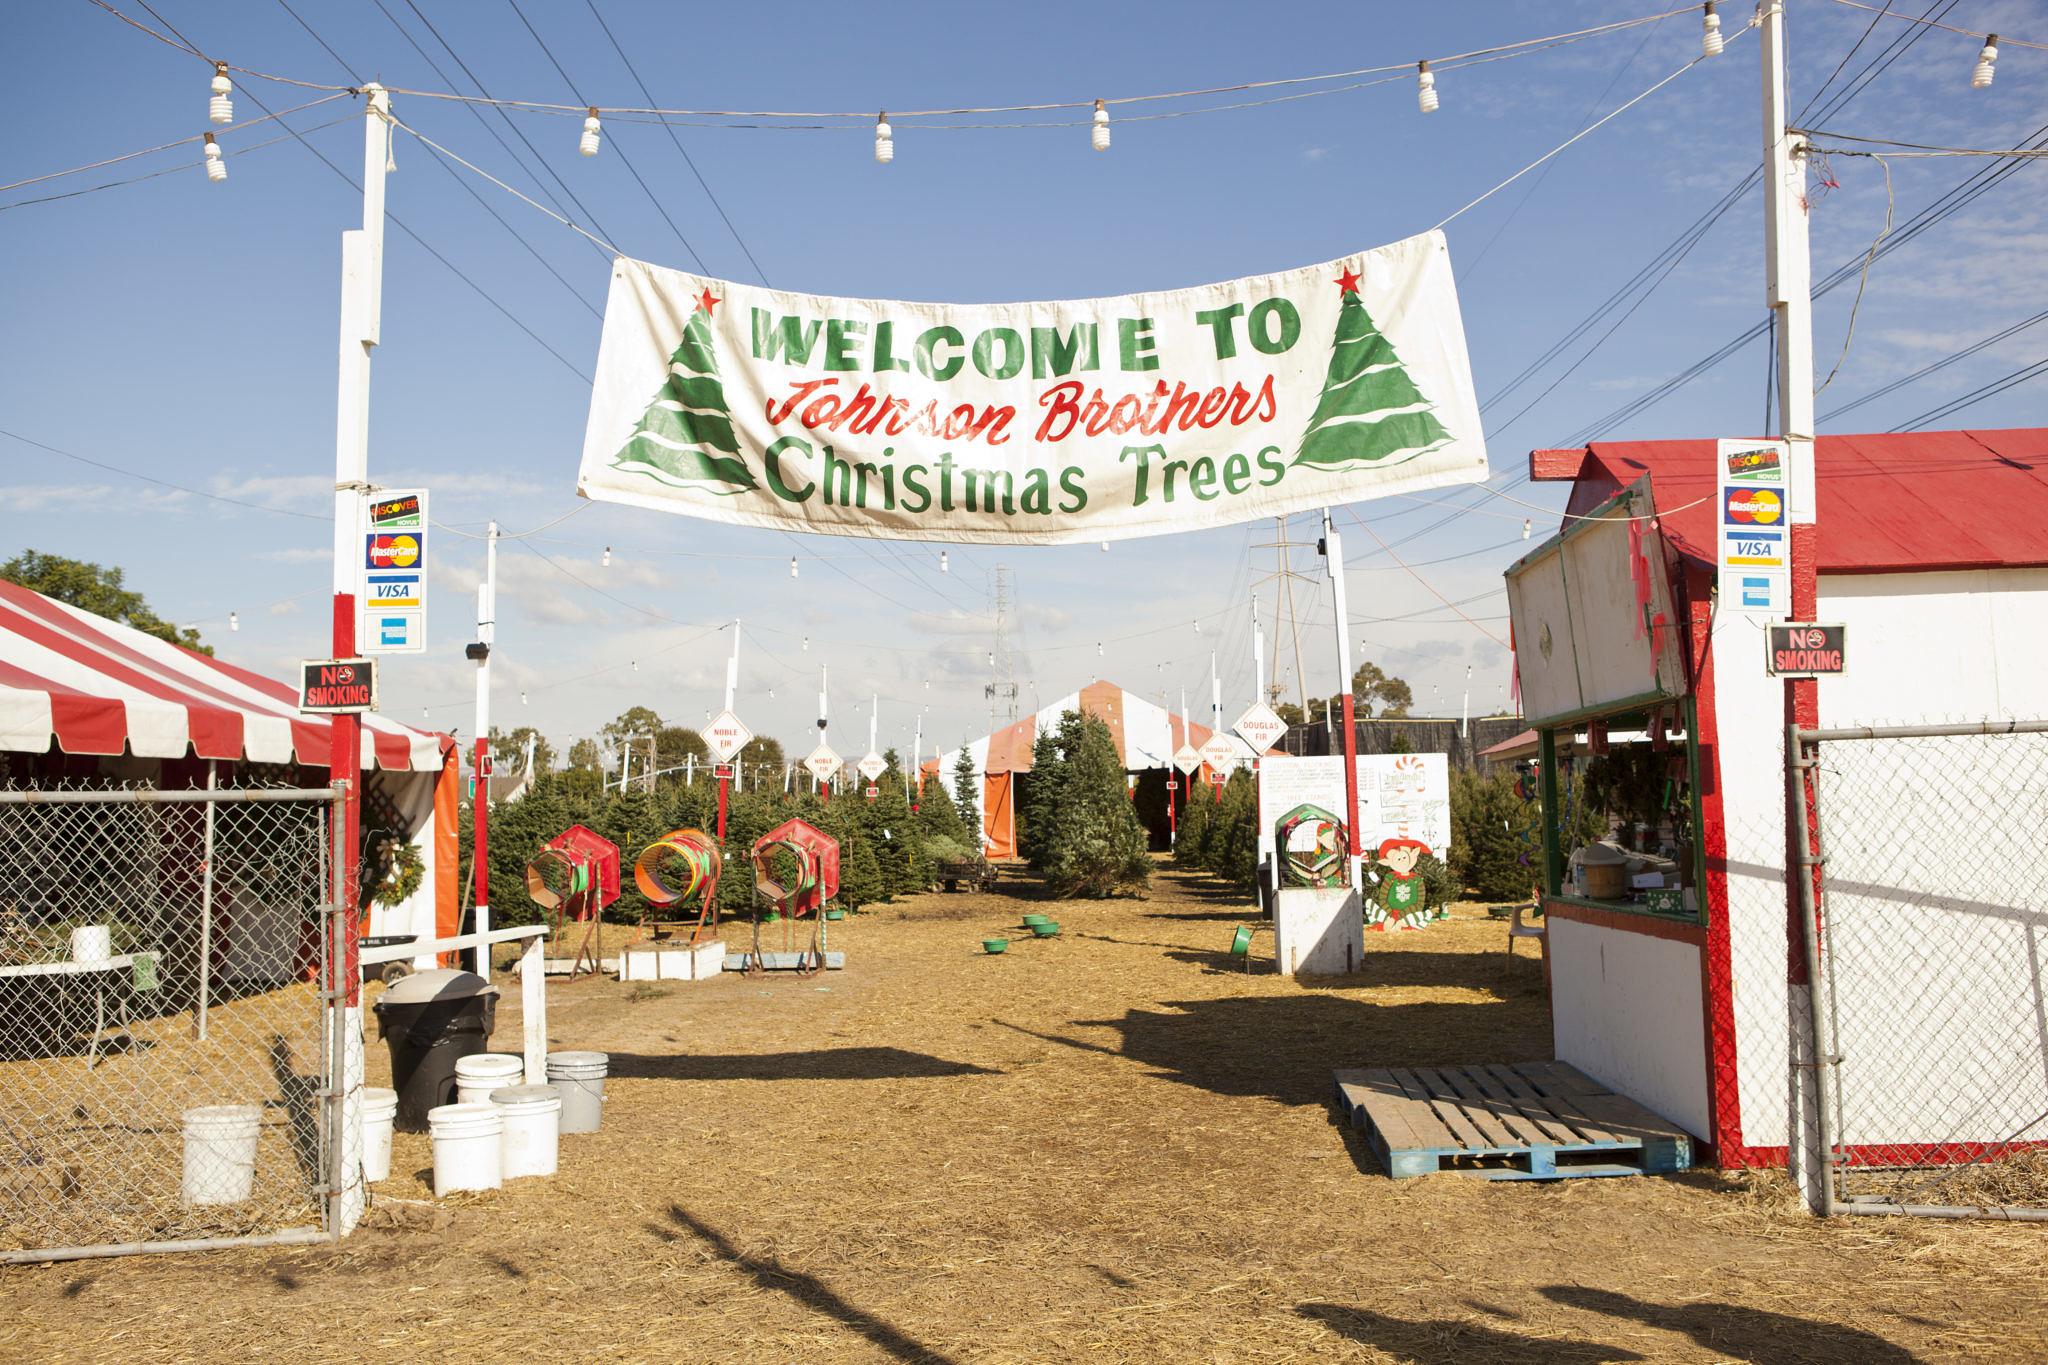 tothineownstylebetrue-johnson-brothers-christmas-trees-2